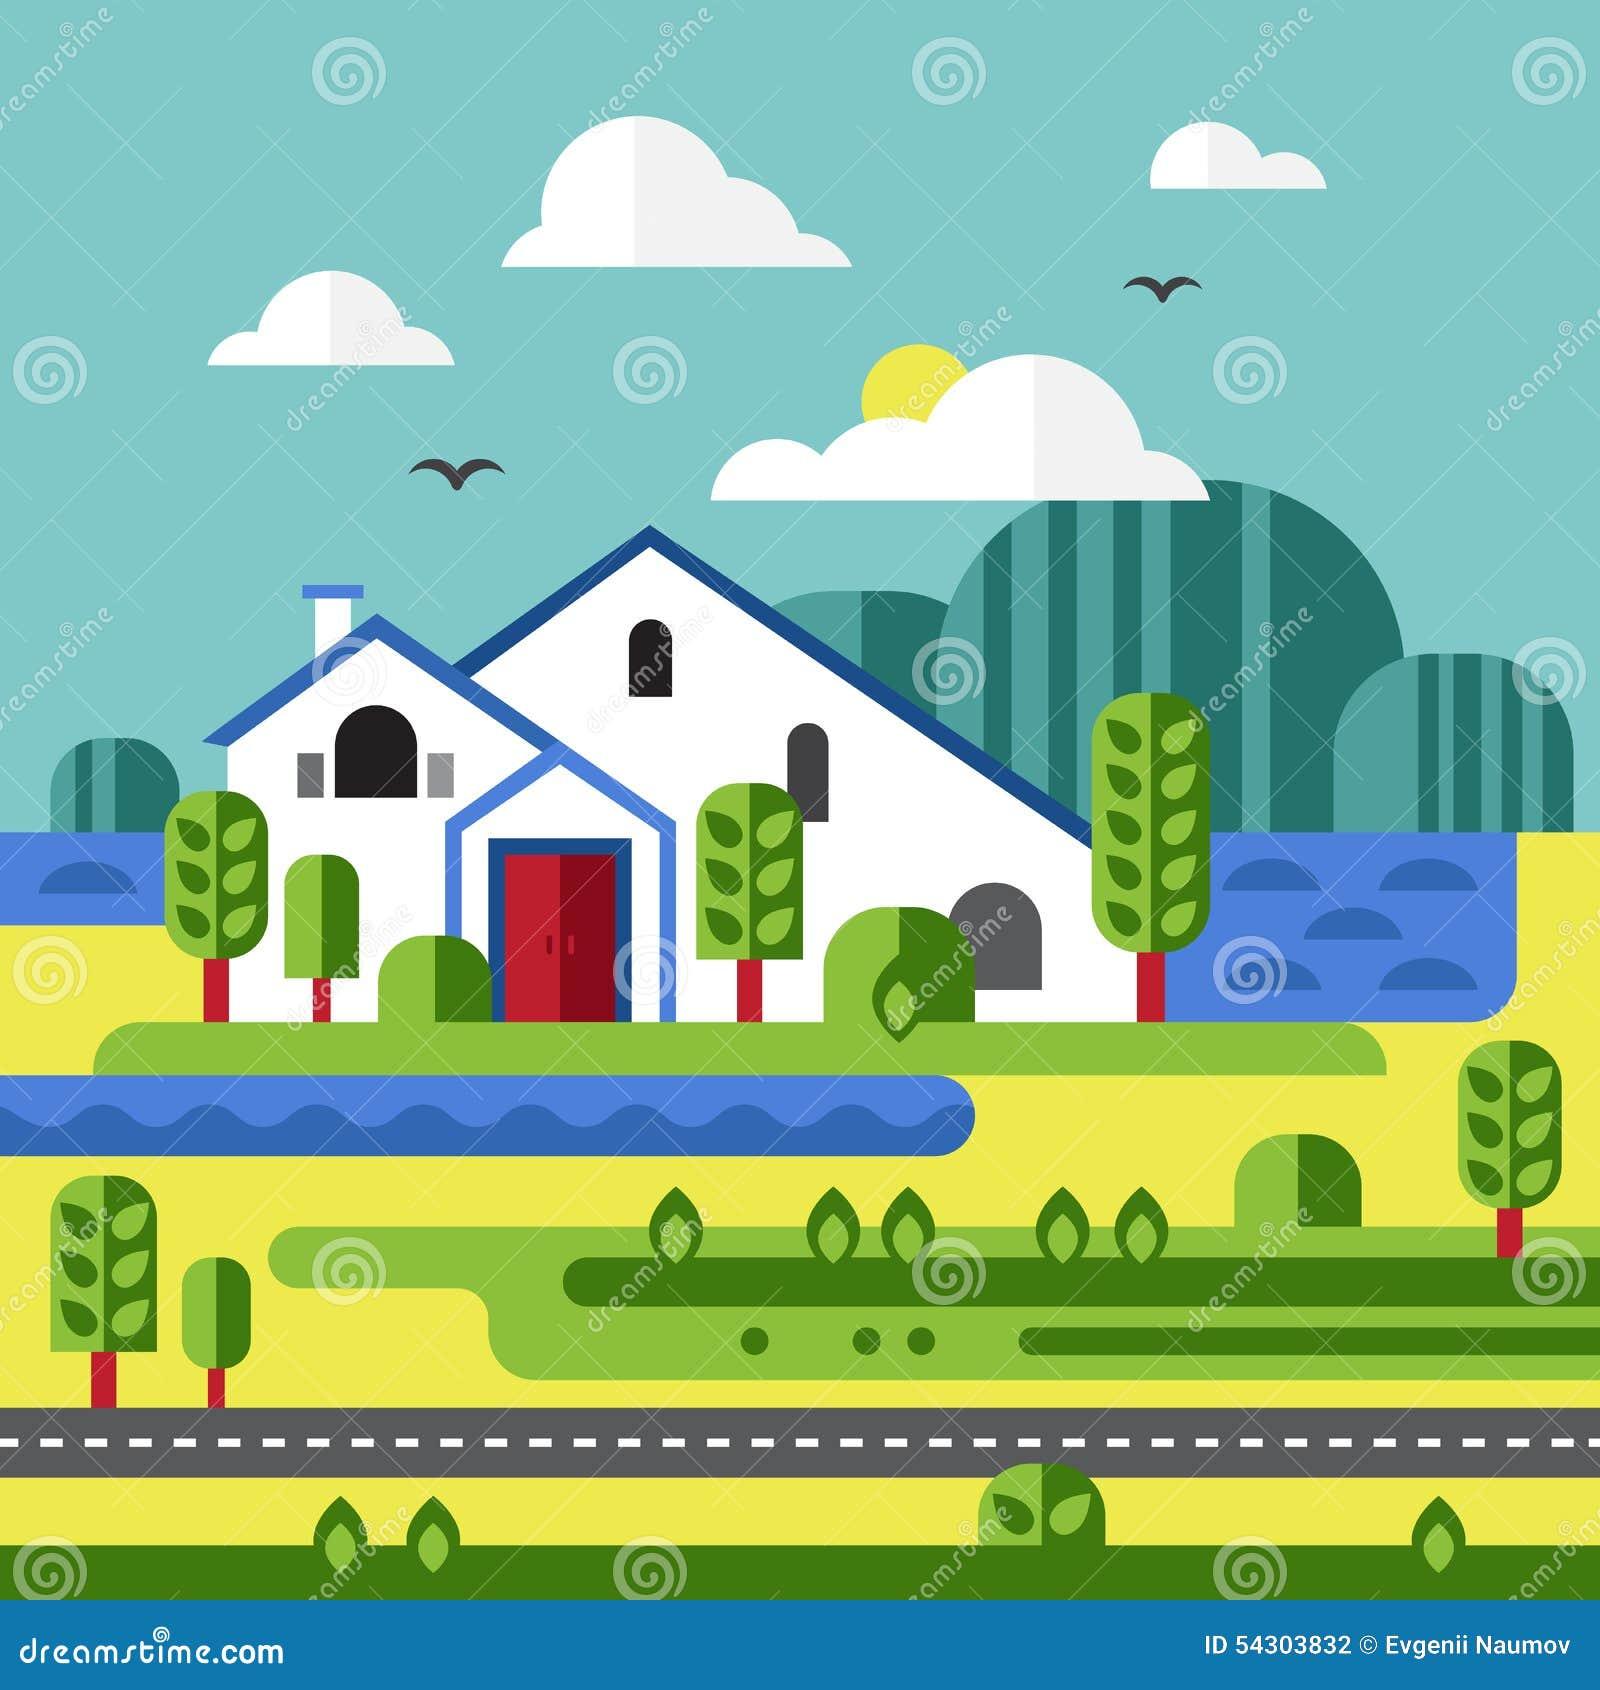 Landscape Illustration Vector Free: Flat Design Vector Of Farm Landscape Stock Vector